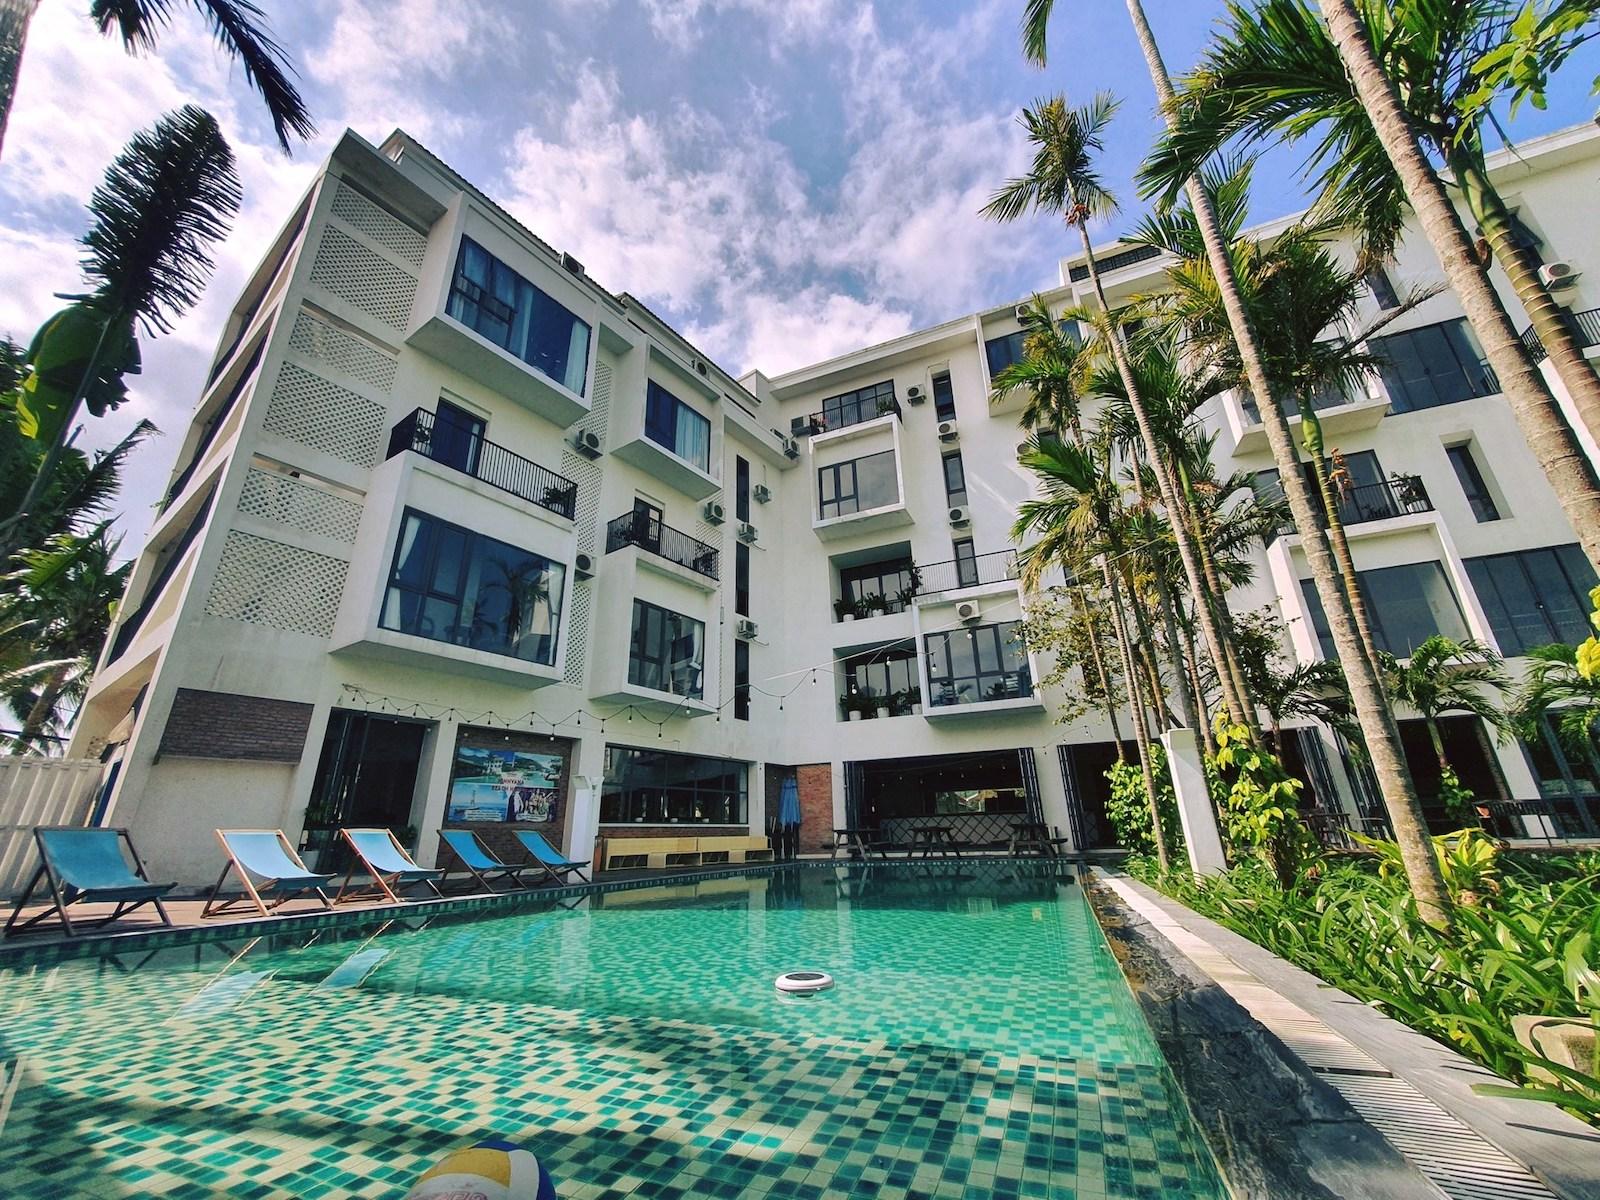 Image of the Vietnam Backpacker Hostels exterior in Hoi An, Vietnam